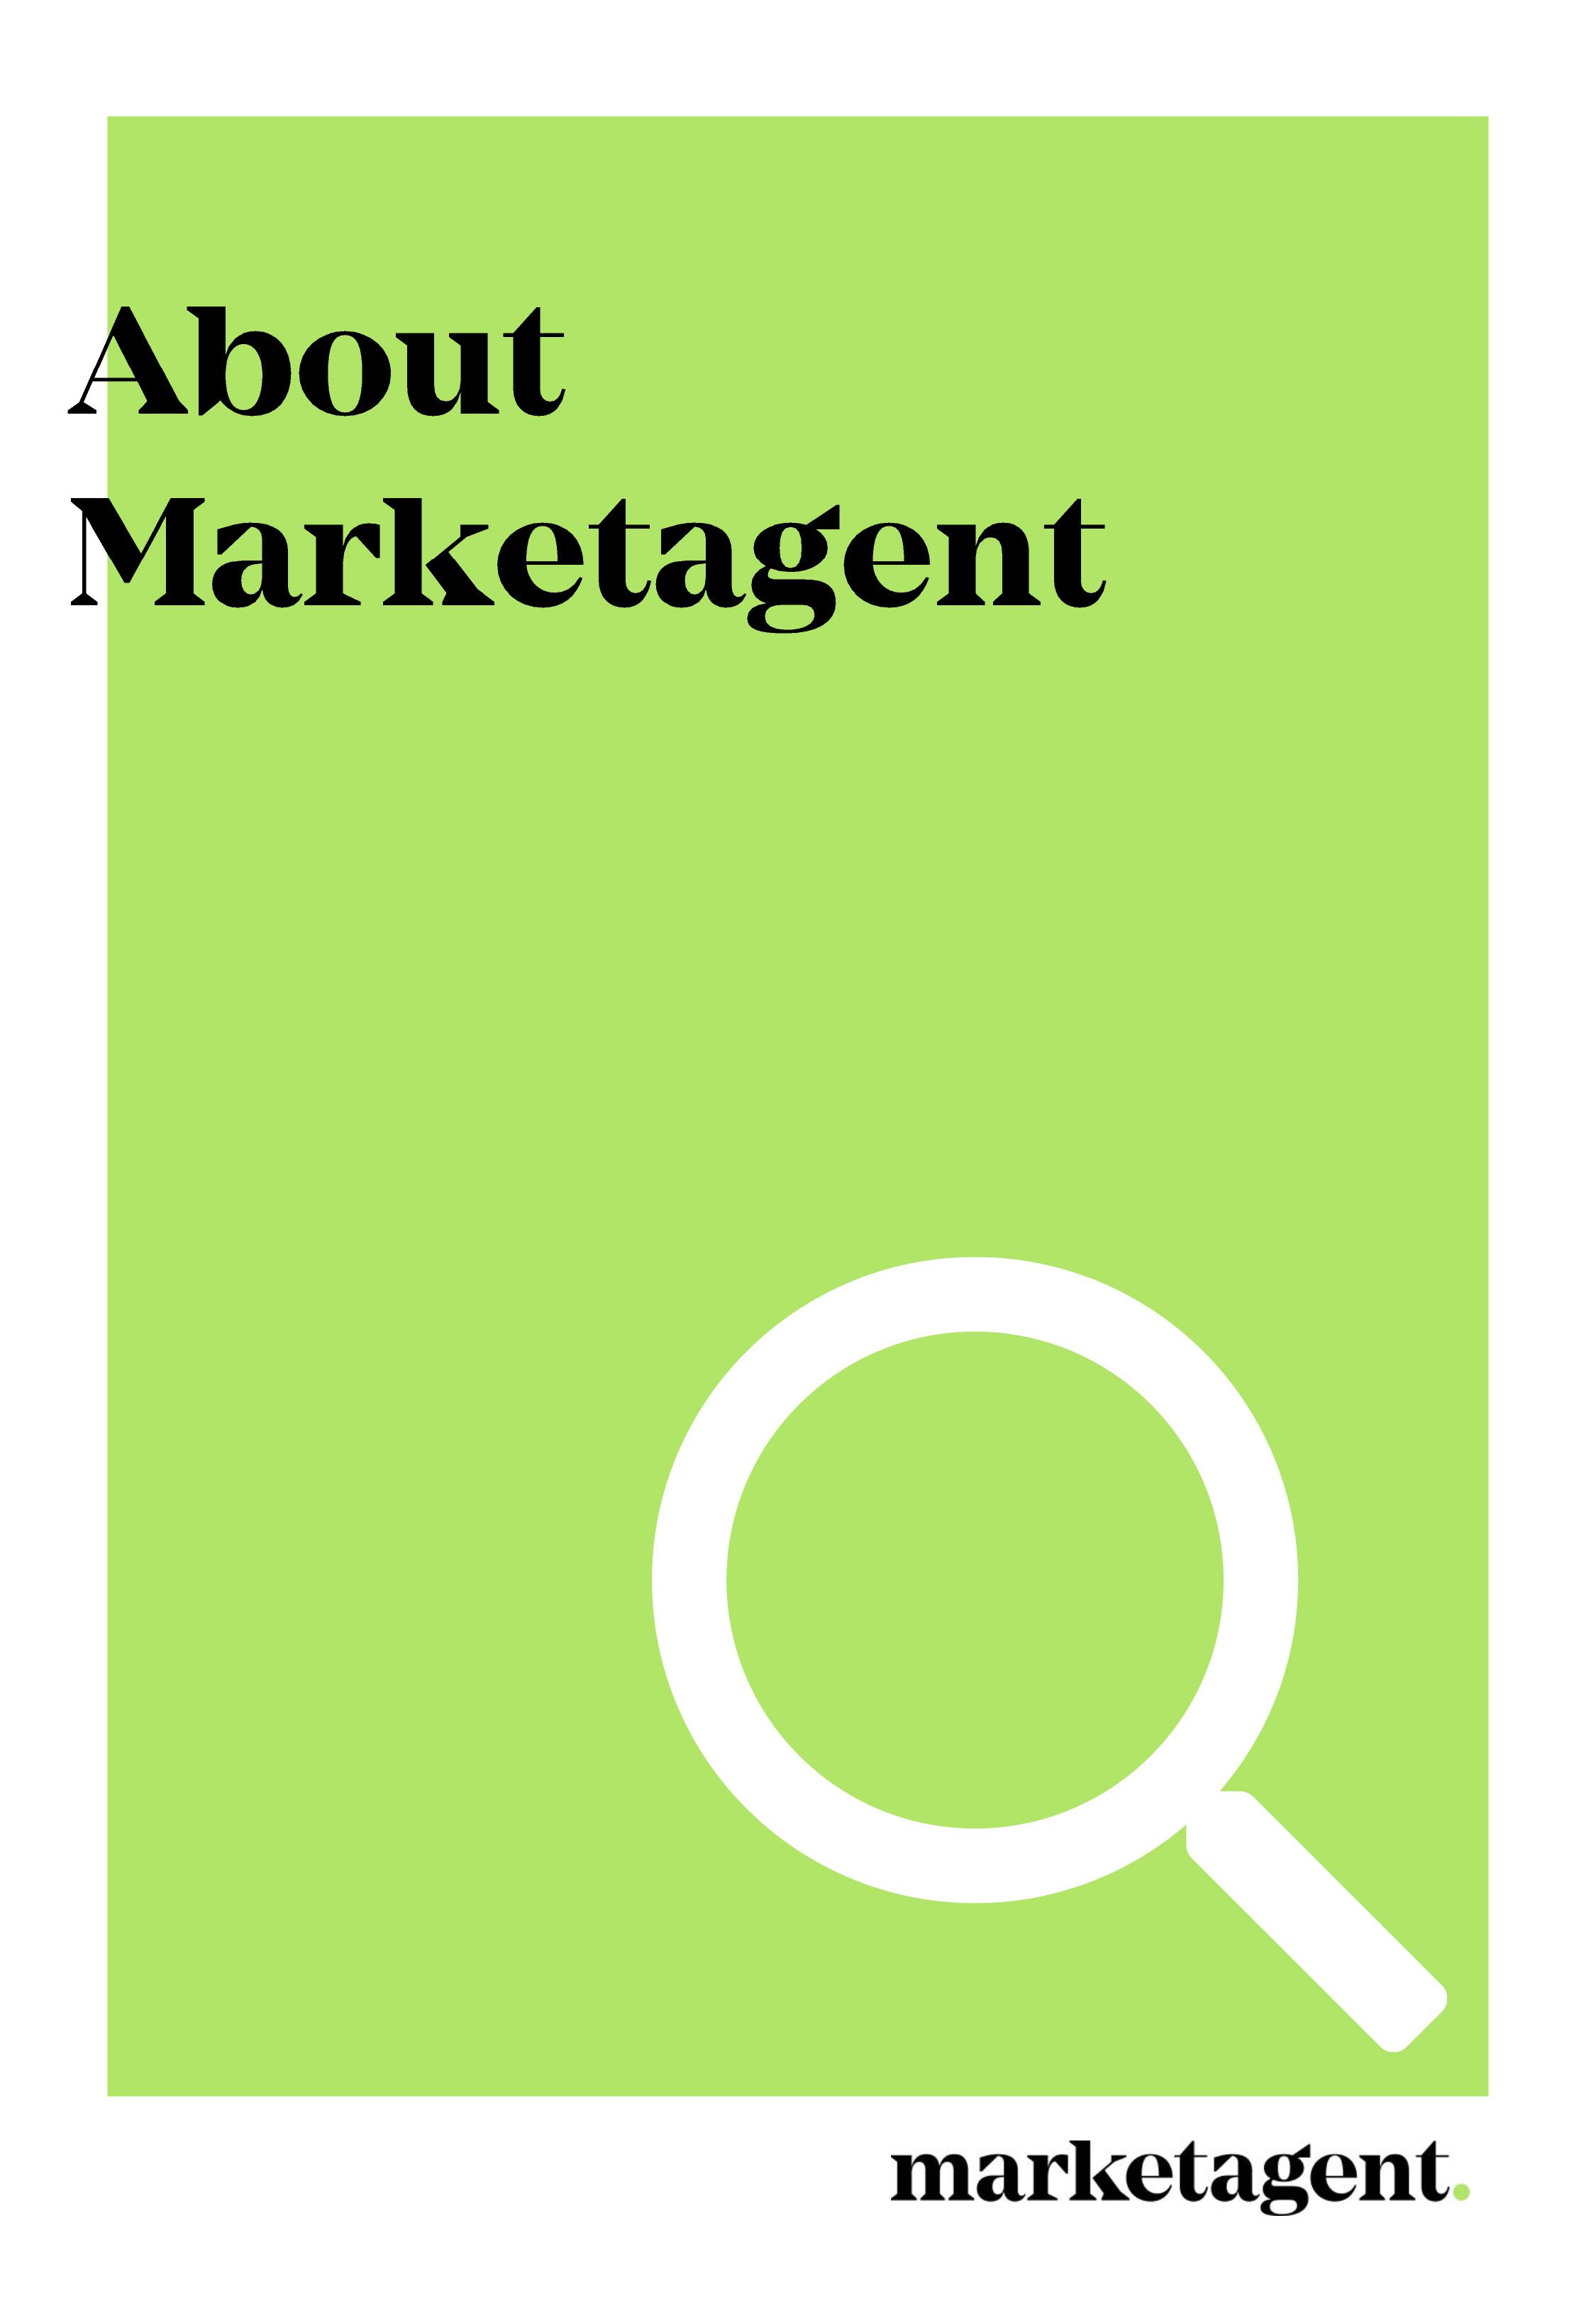 About Marketagent